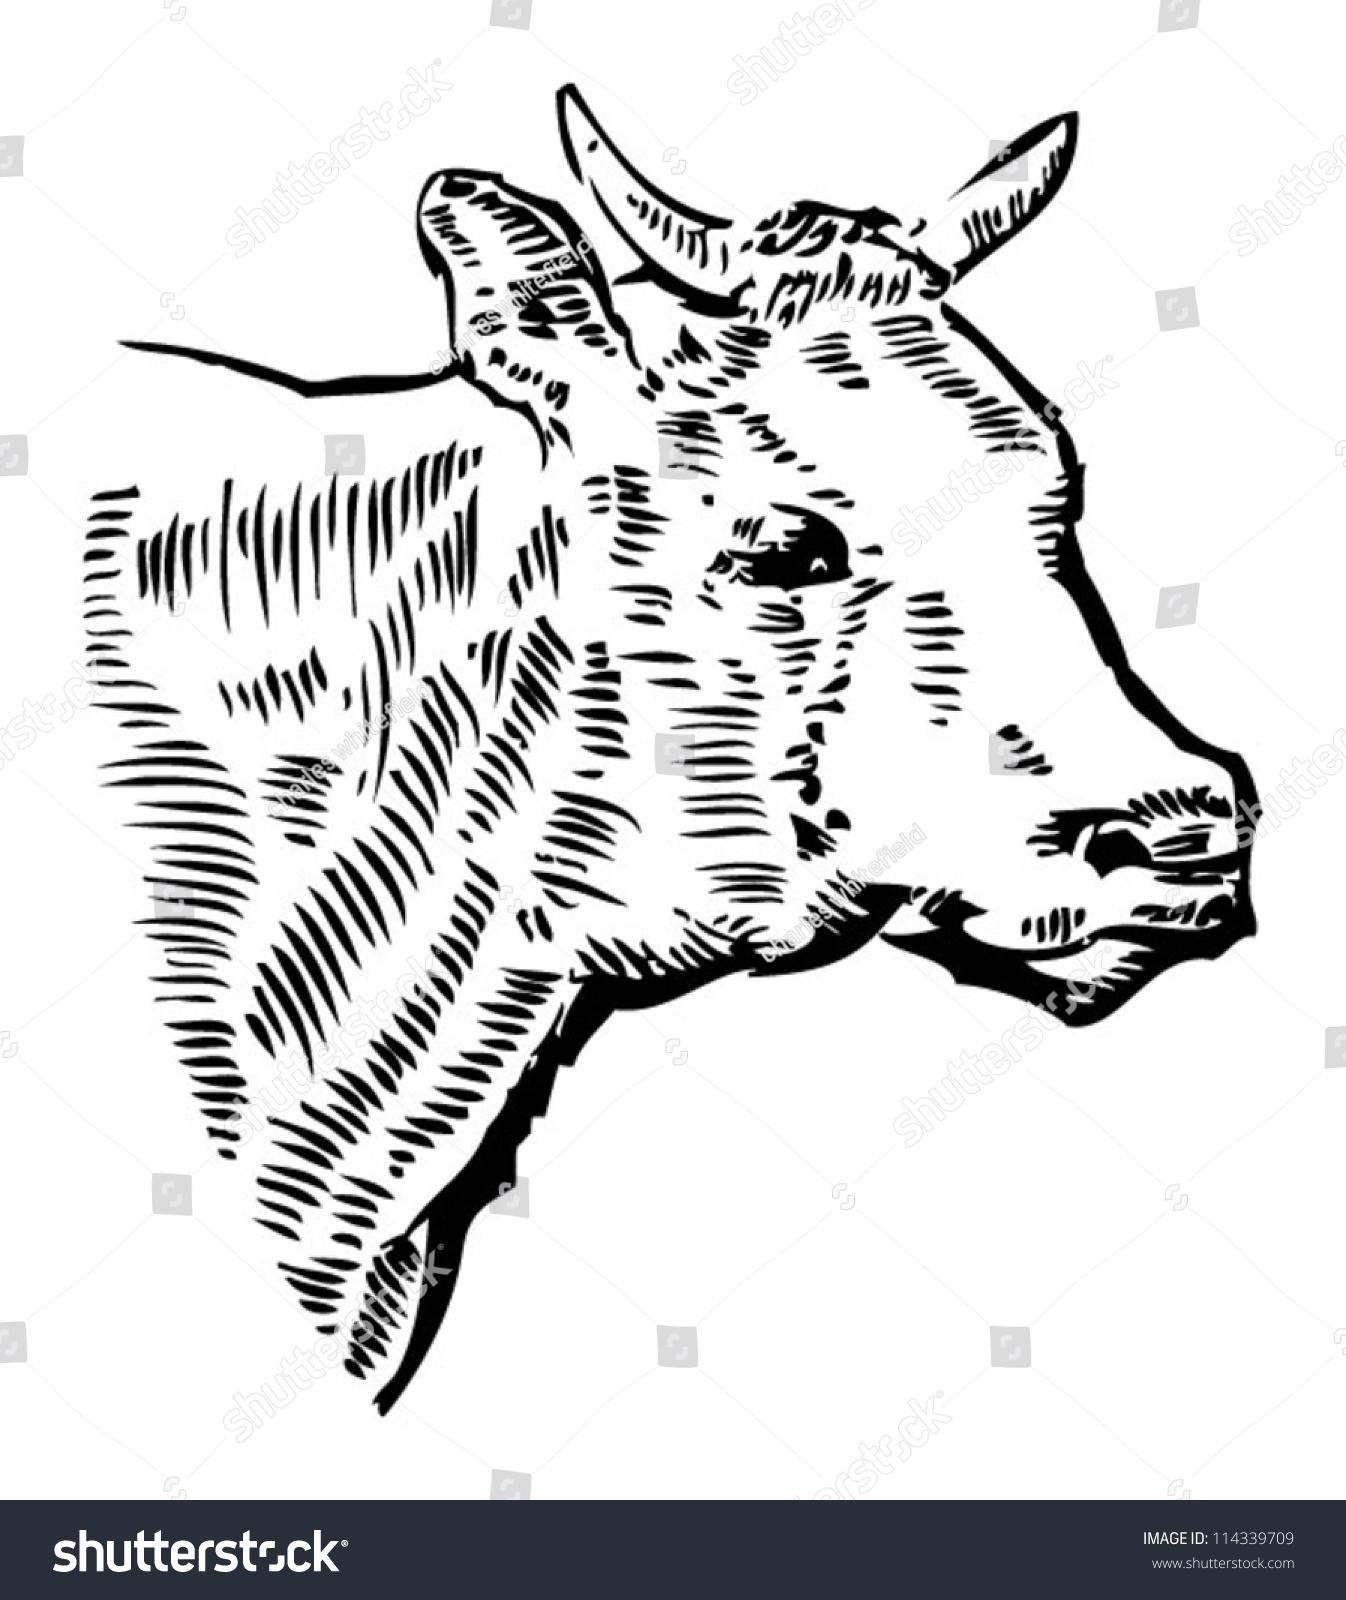 Uncategorized Cow Head Drawing cow head drawing stock vector 114339709 shutterstock drawing